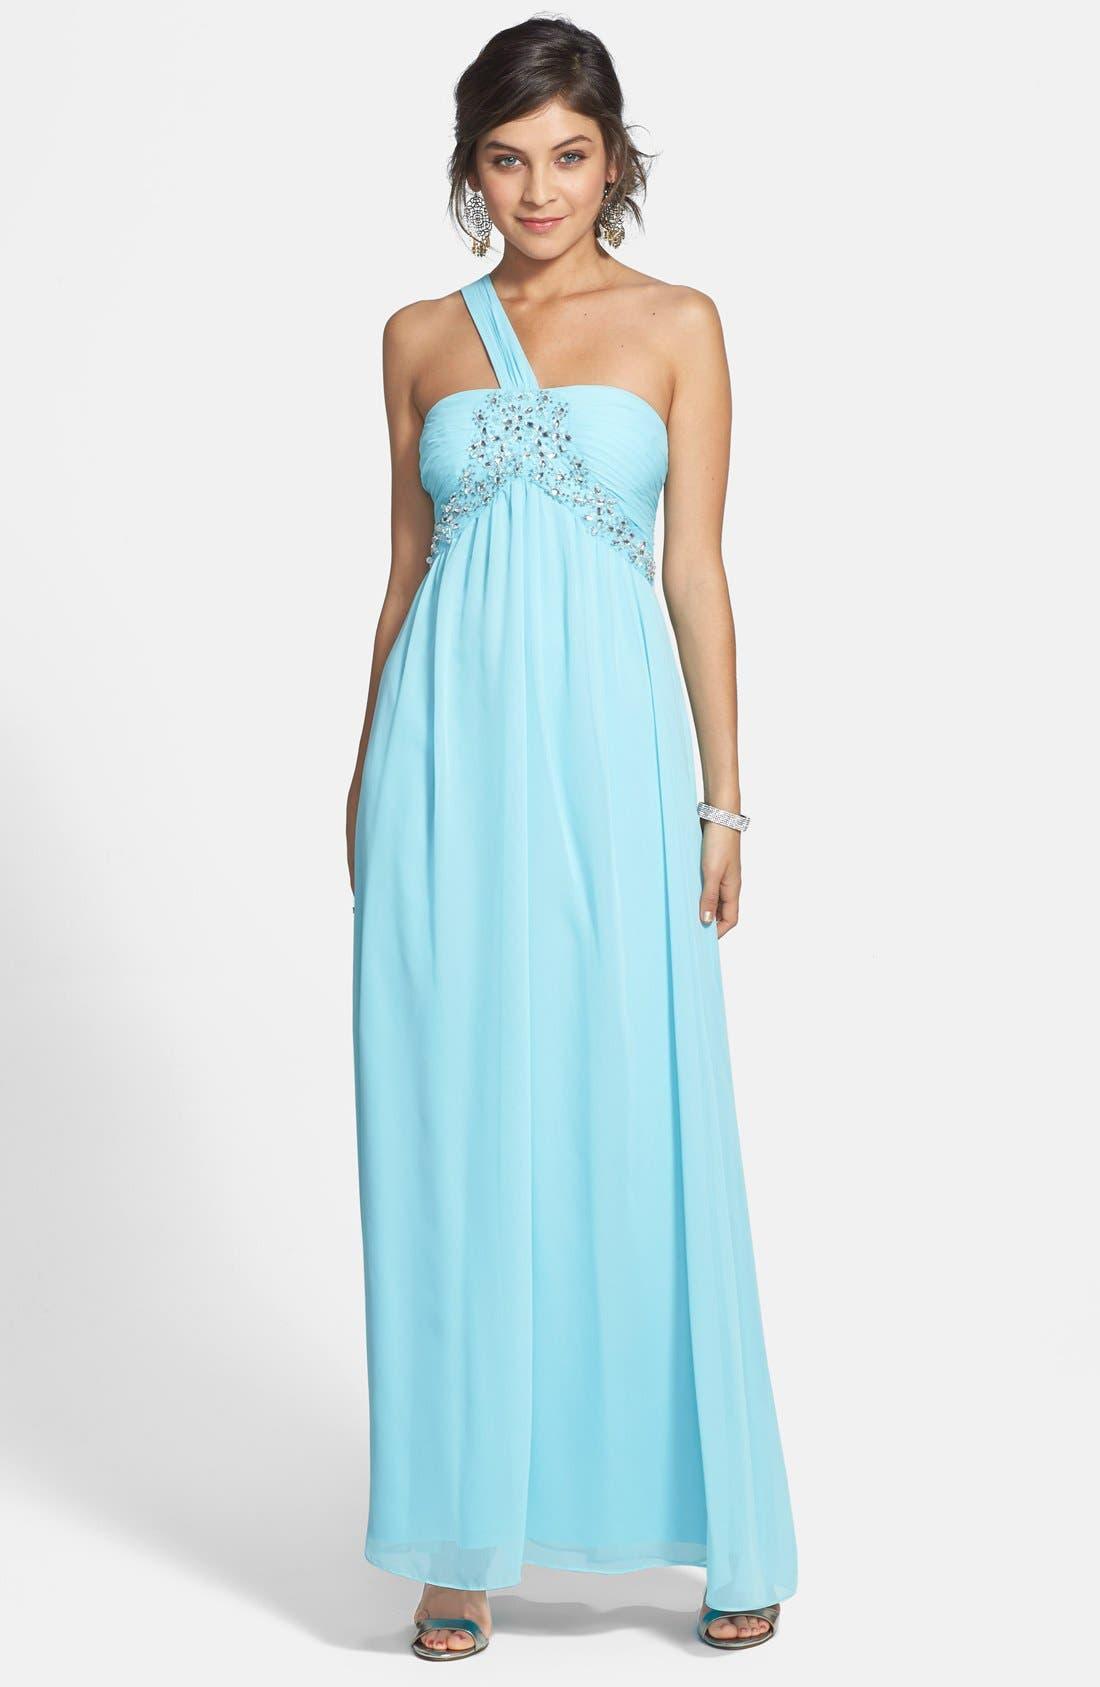 Alternate Image 1 Selected - Hailey Logan Embellished One-Shoulder Gown (Juniors)